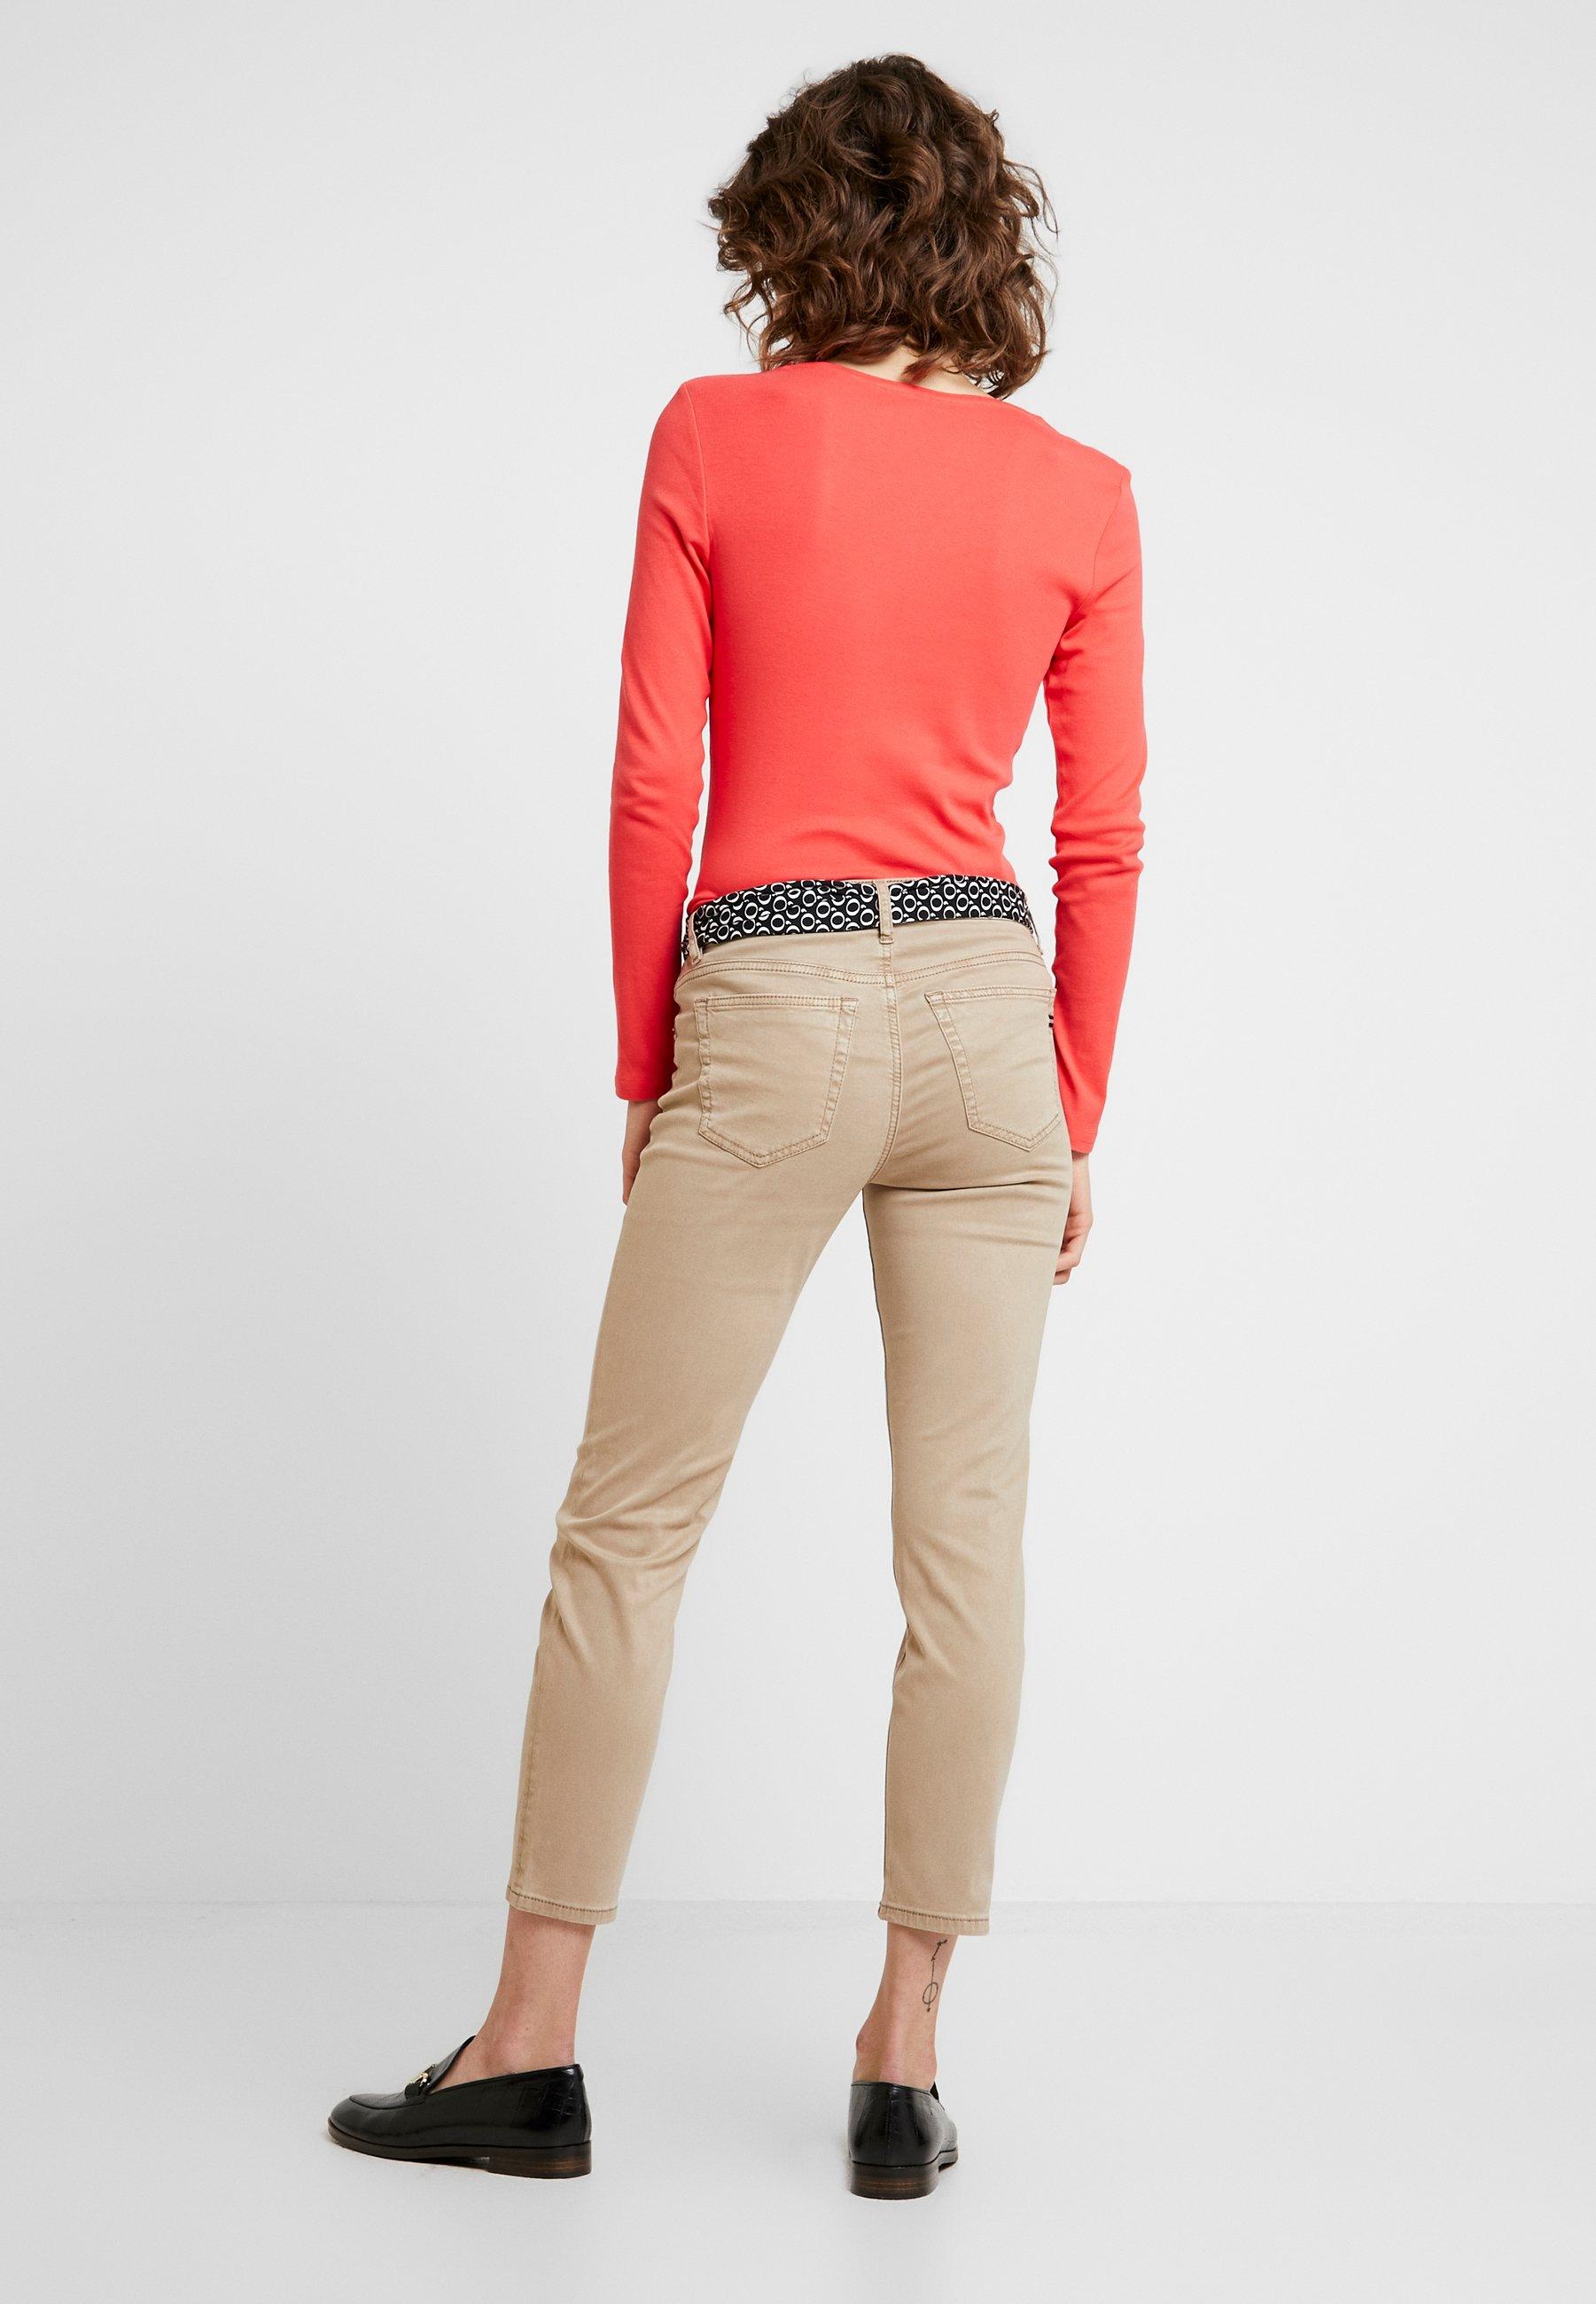 Marc O'Polo MID WAIST - Pantalon classique - norse sand - Pantalons & Leggings Femme qs6YT